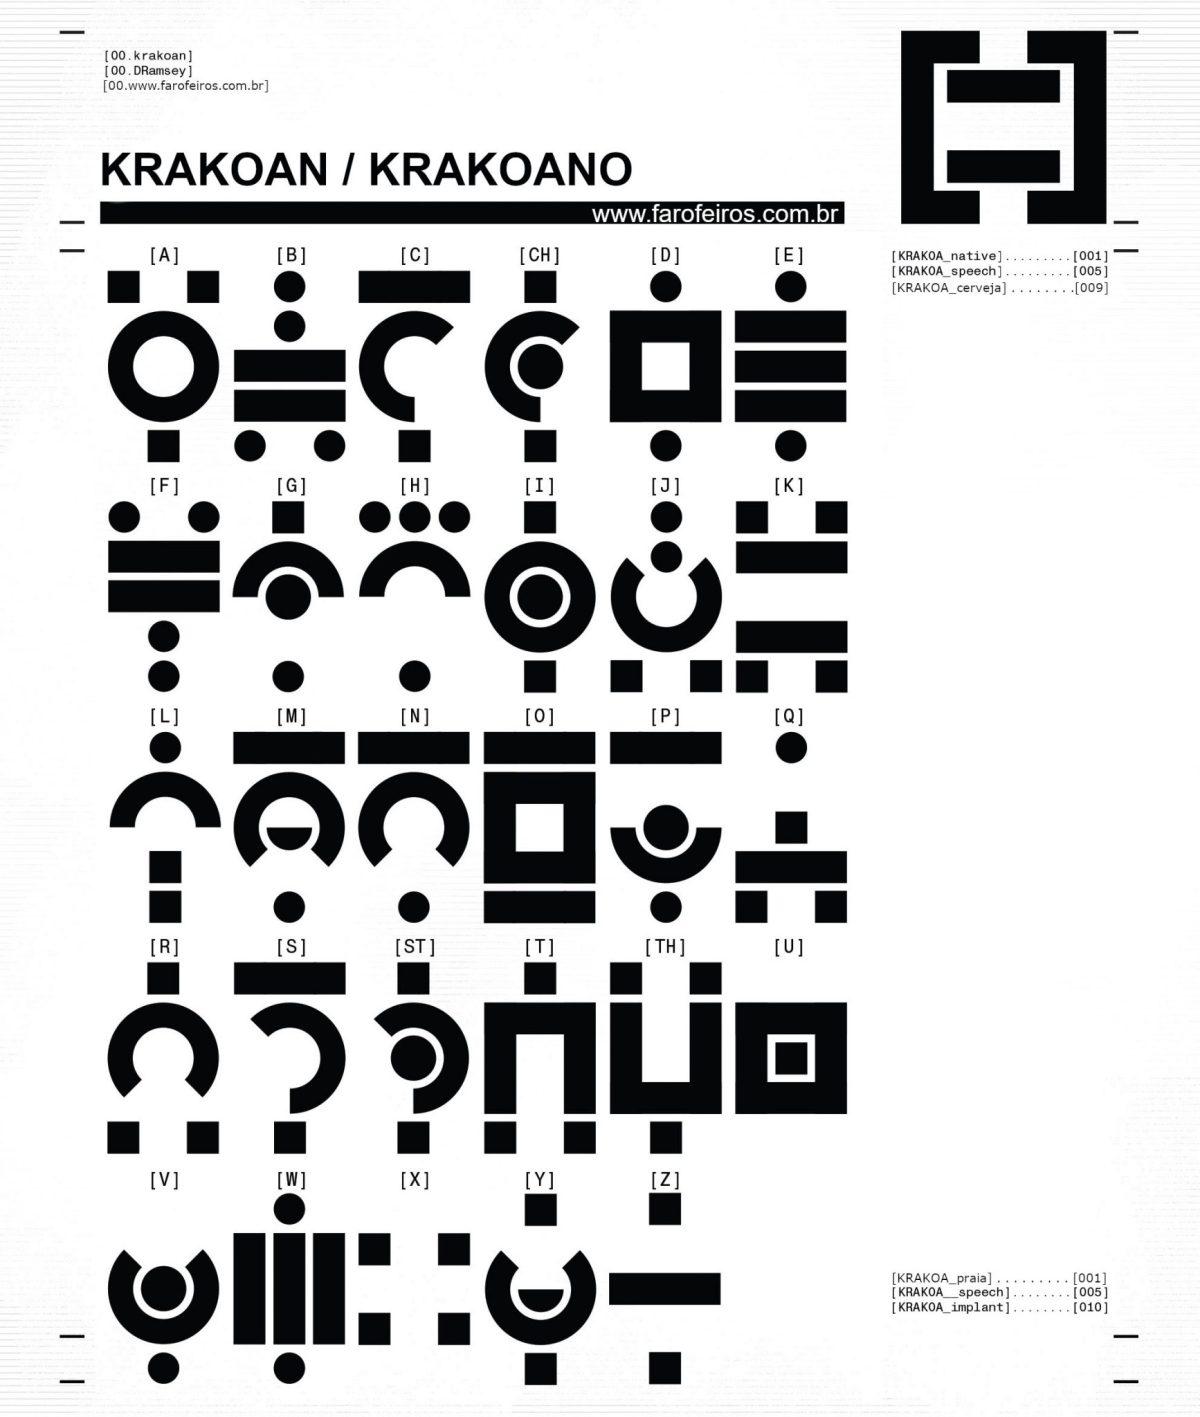 Krakoan - Krakoano - House of X #3 - X-Men - Jonathan Hickman - Blog Farofeiros